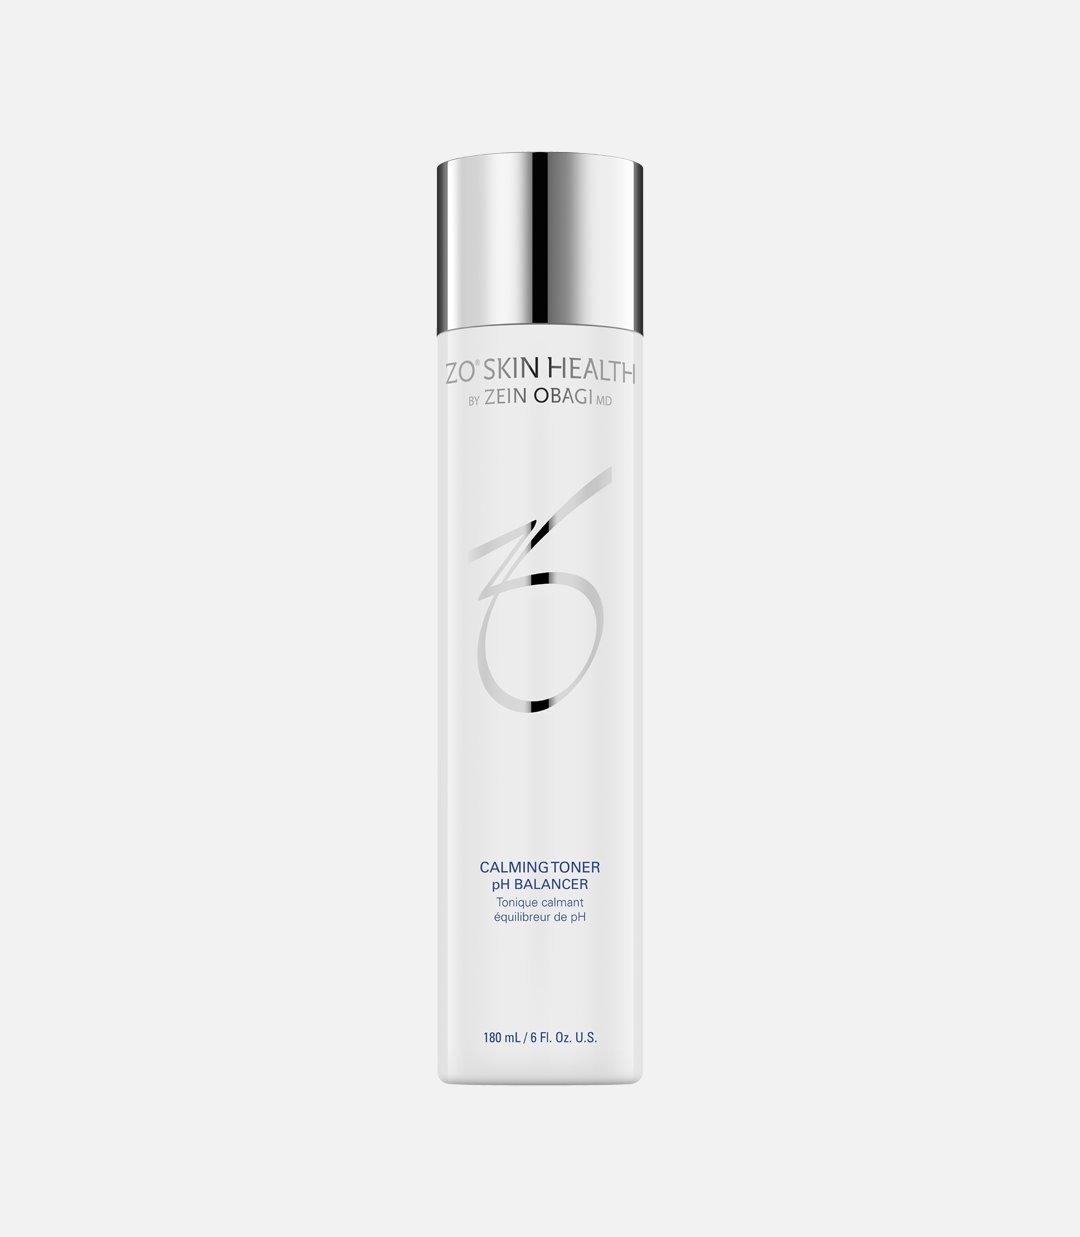 ZO Skin Health Calming Toner, PH Balancer